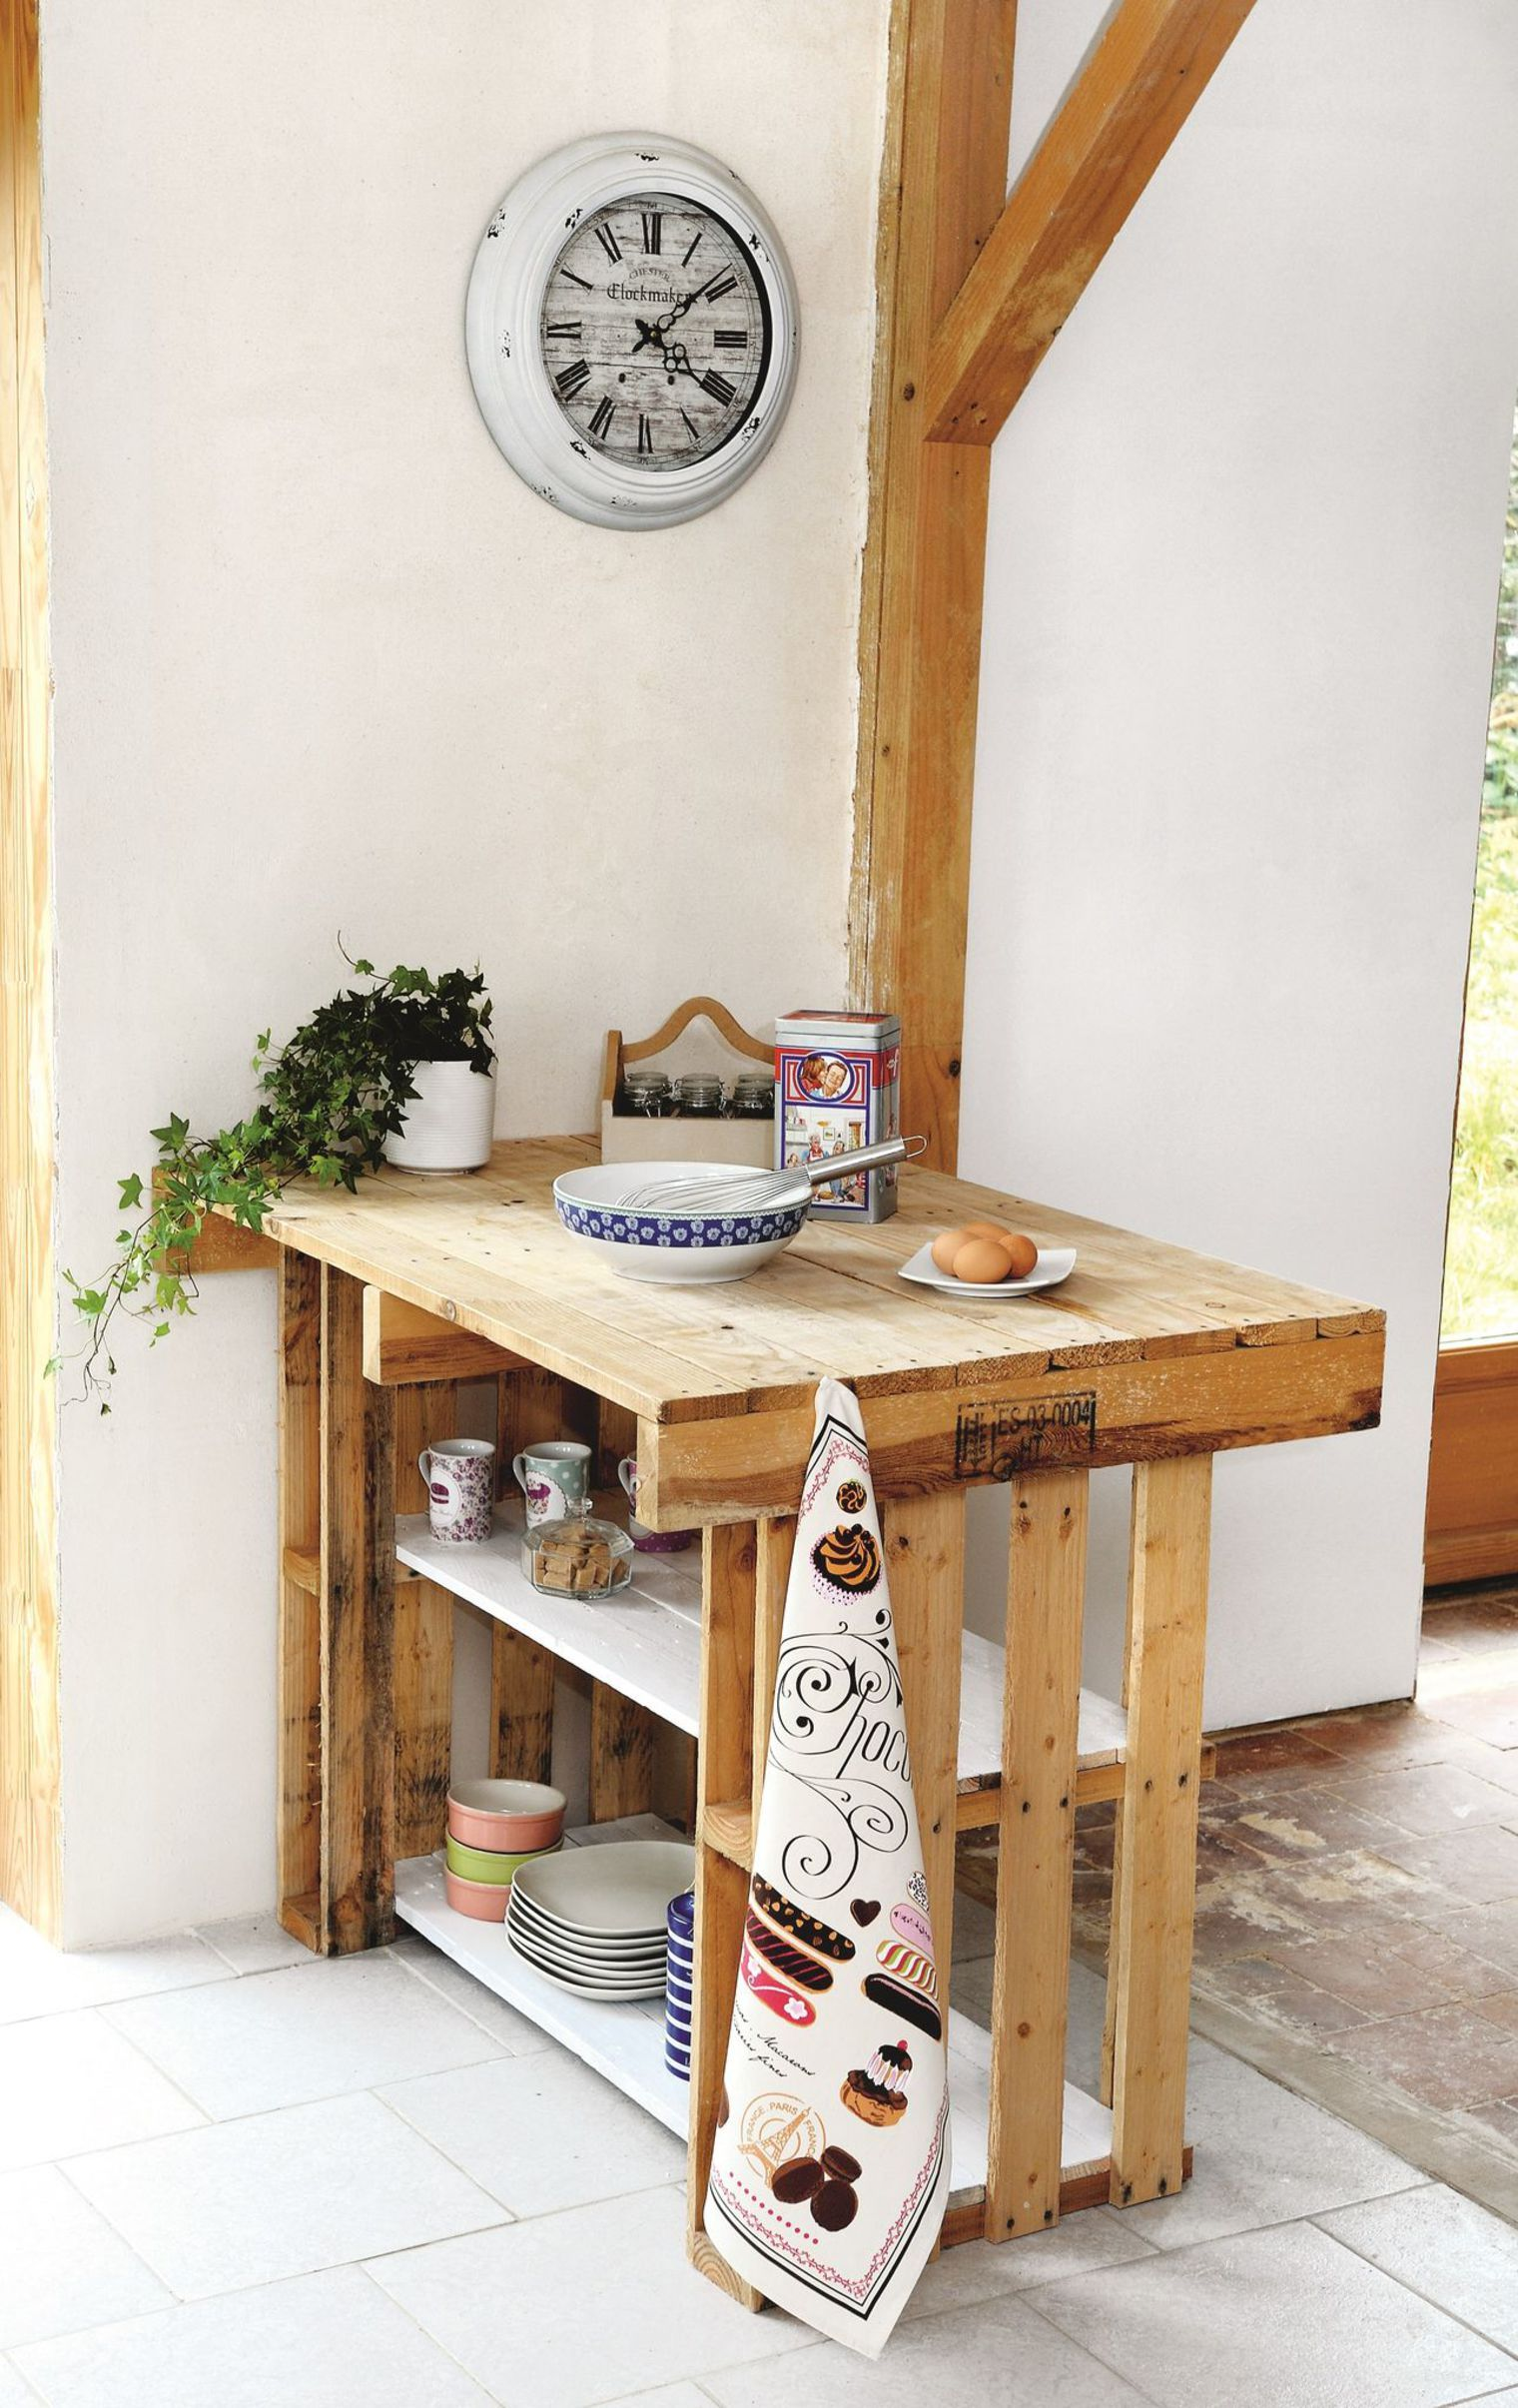 Cucina Pallet Fai Da Te moduli e pensili. costruire mobili cucina fai da te cucina